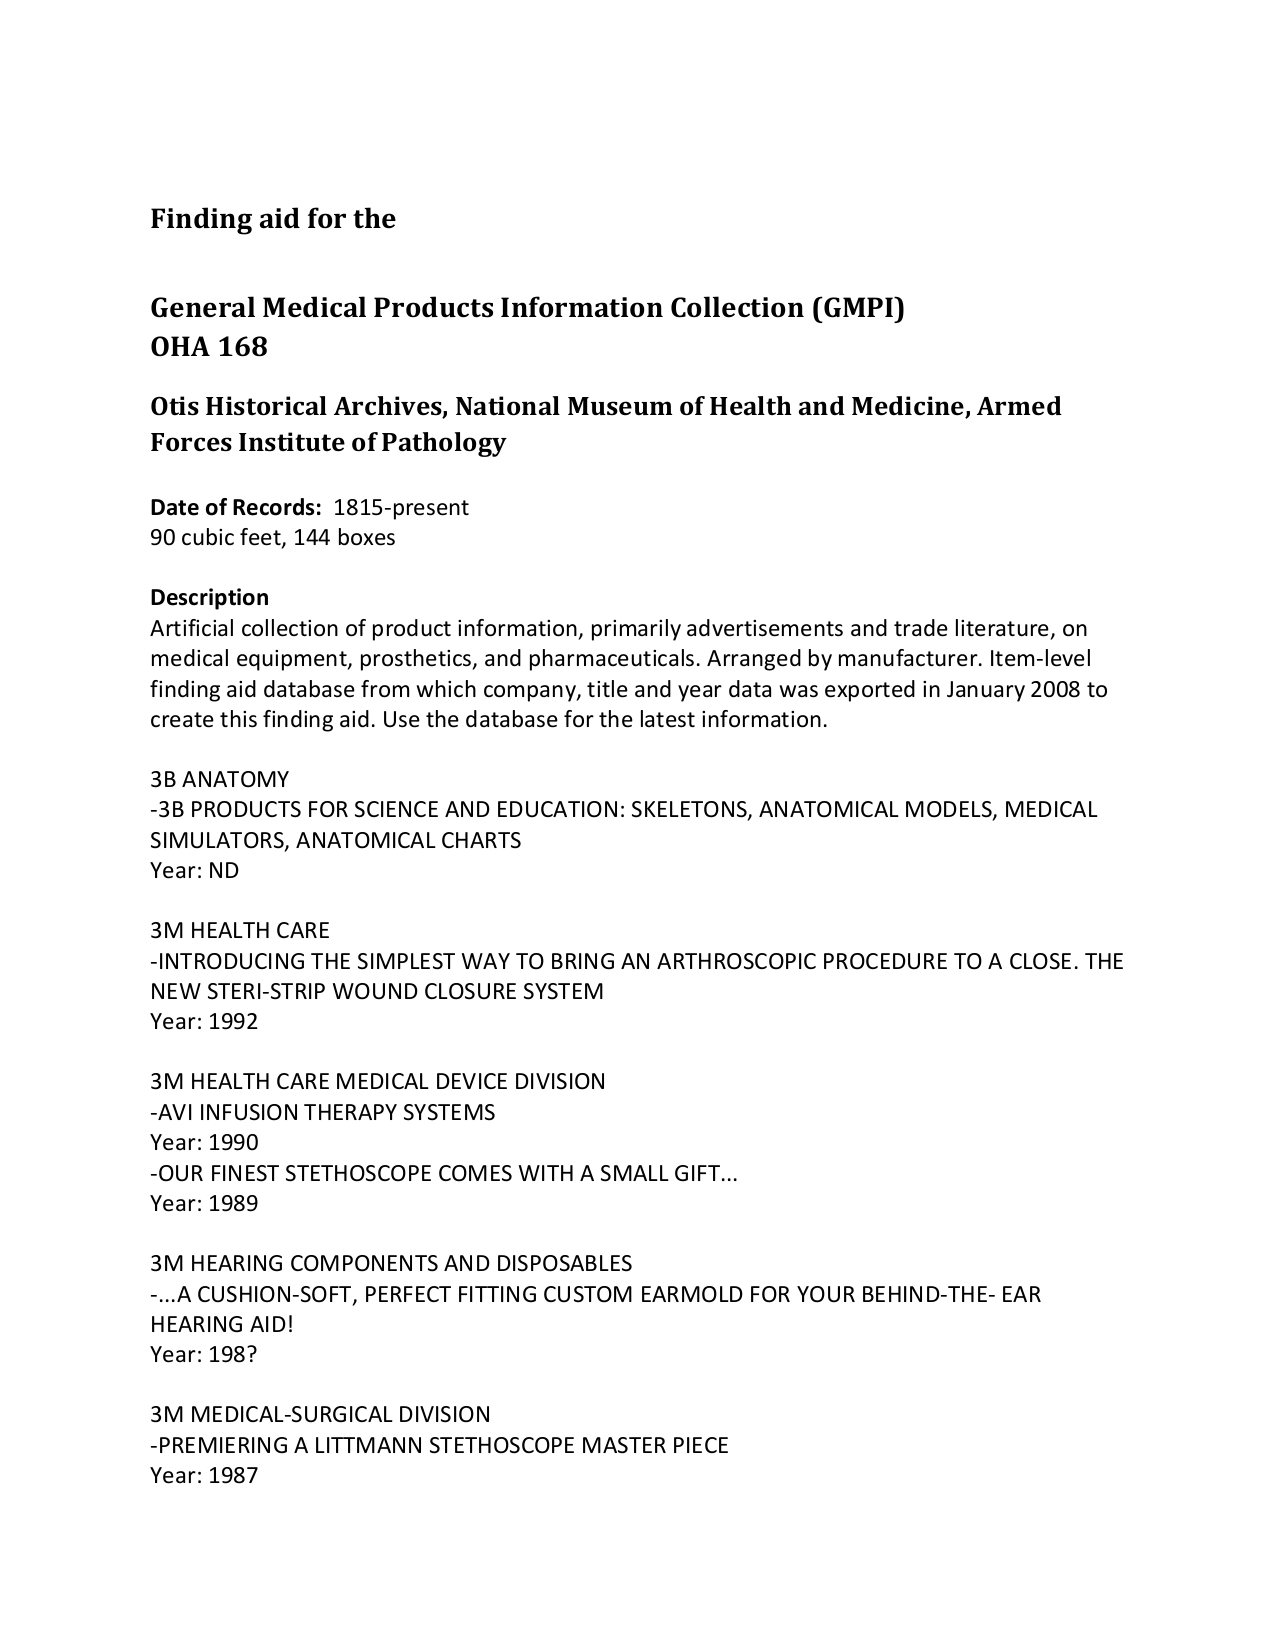 pdf for Laser Other AO-EARS Earphones manual